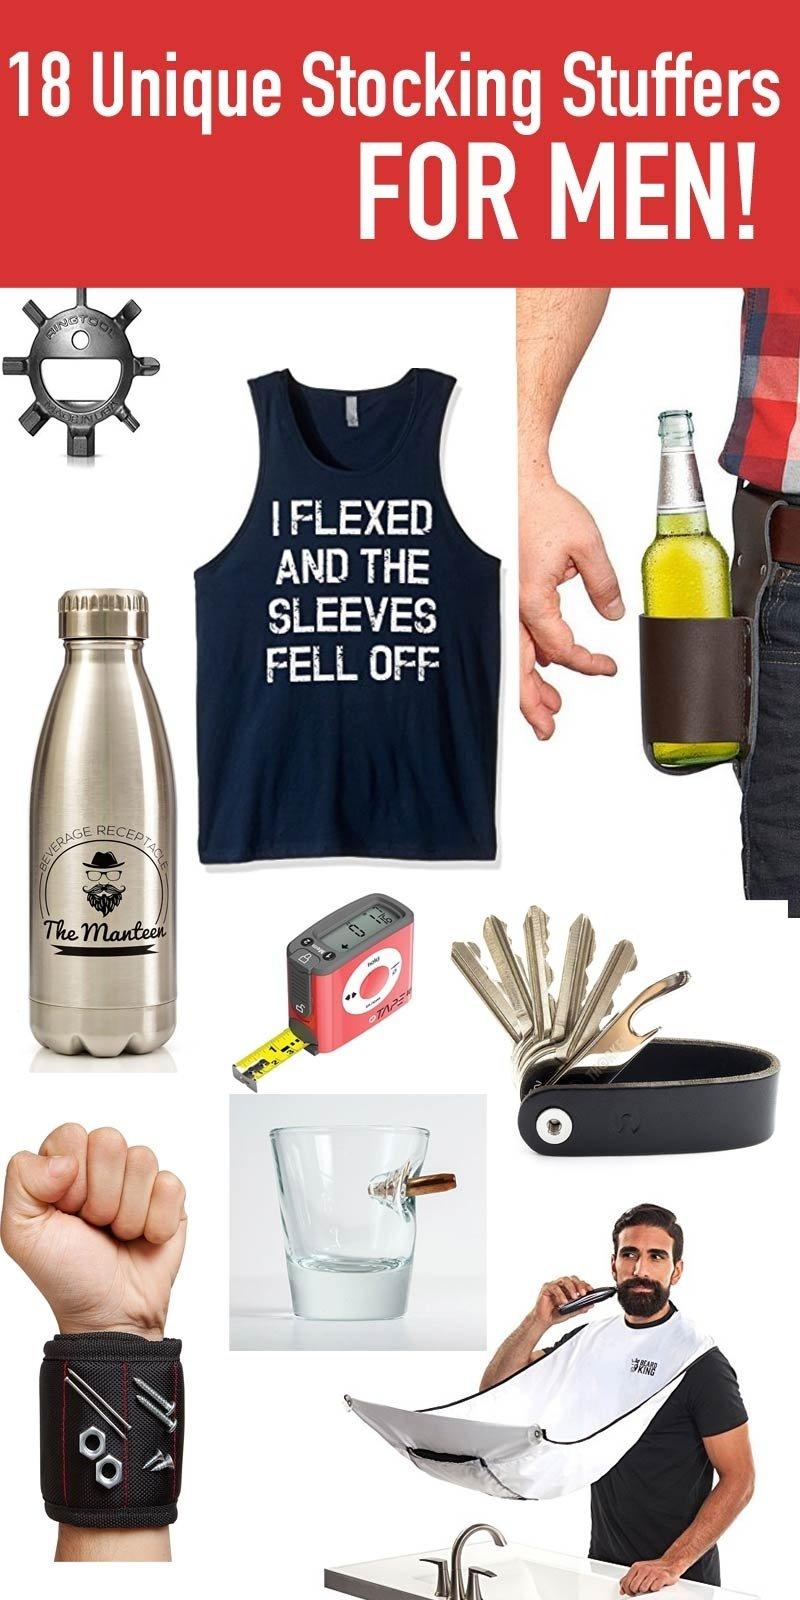 10 Fabulous Stocking Stuffers For Men Ideas 18 stocking stuffer ideas for men christ centered holidays 1 2020